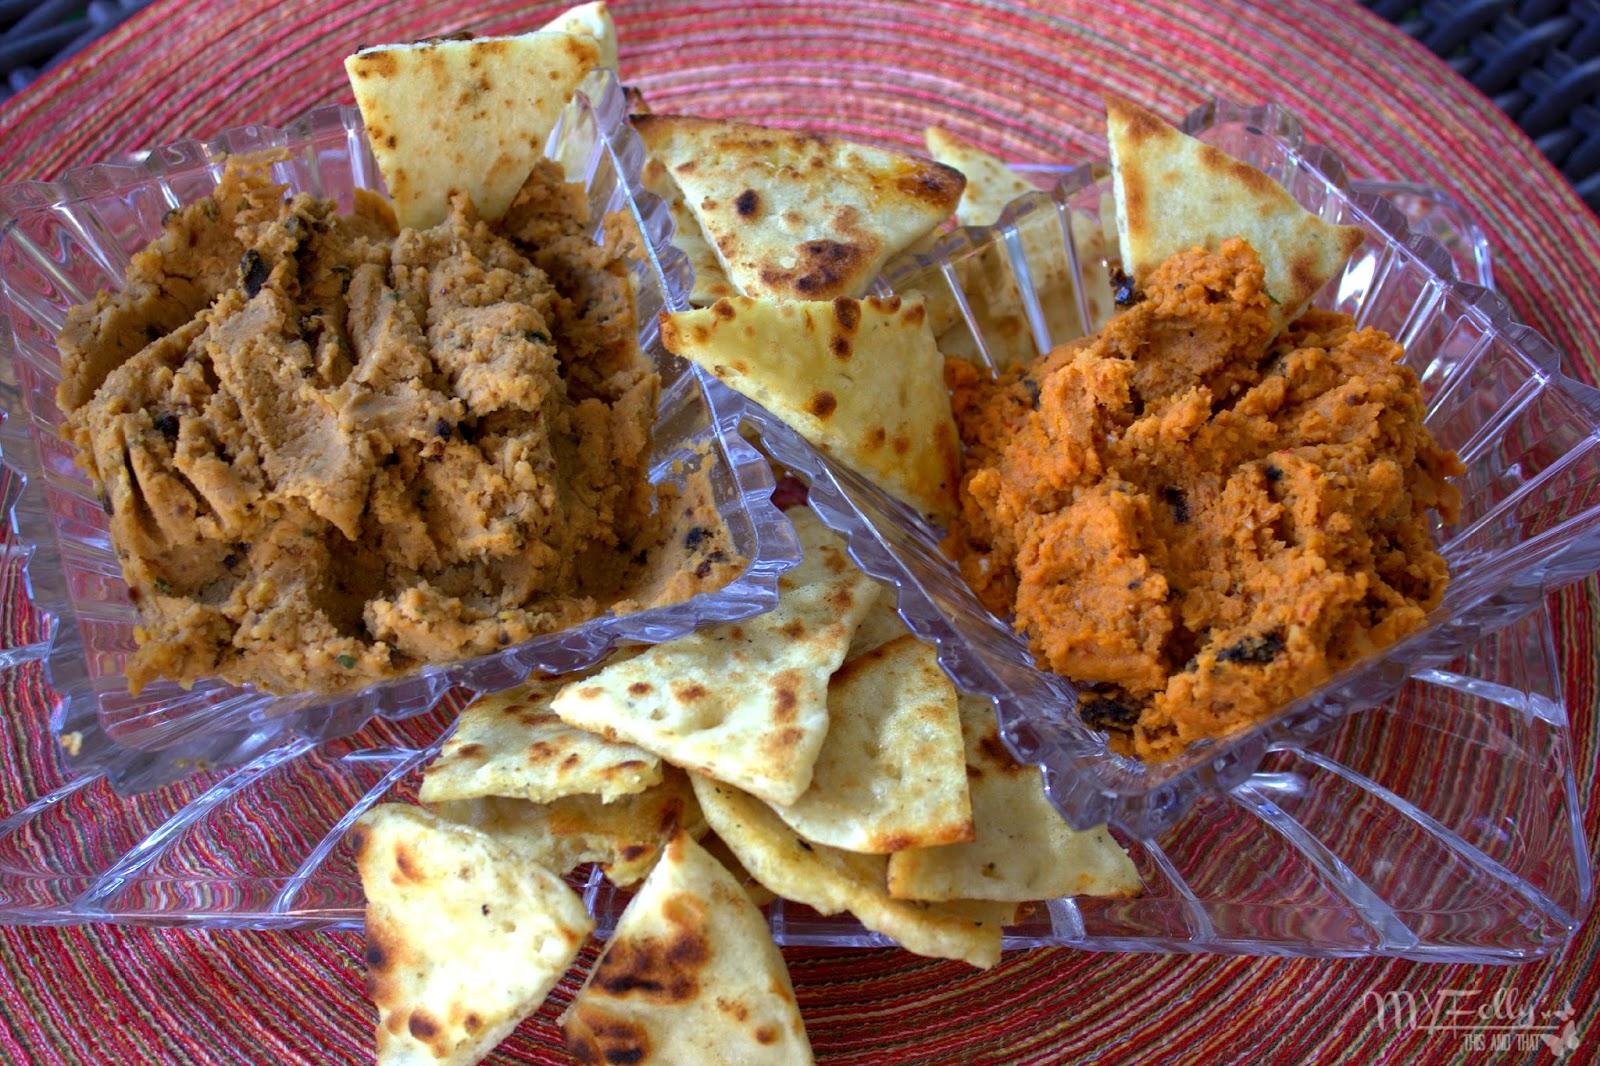 Pita and Hummus/This and That #hummus #Garbanzo Beans #vegetarian